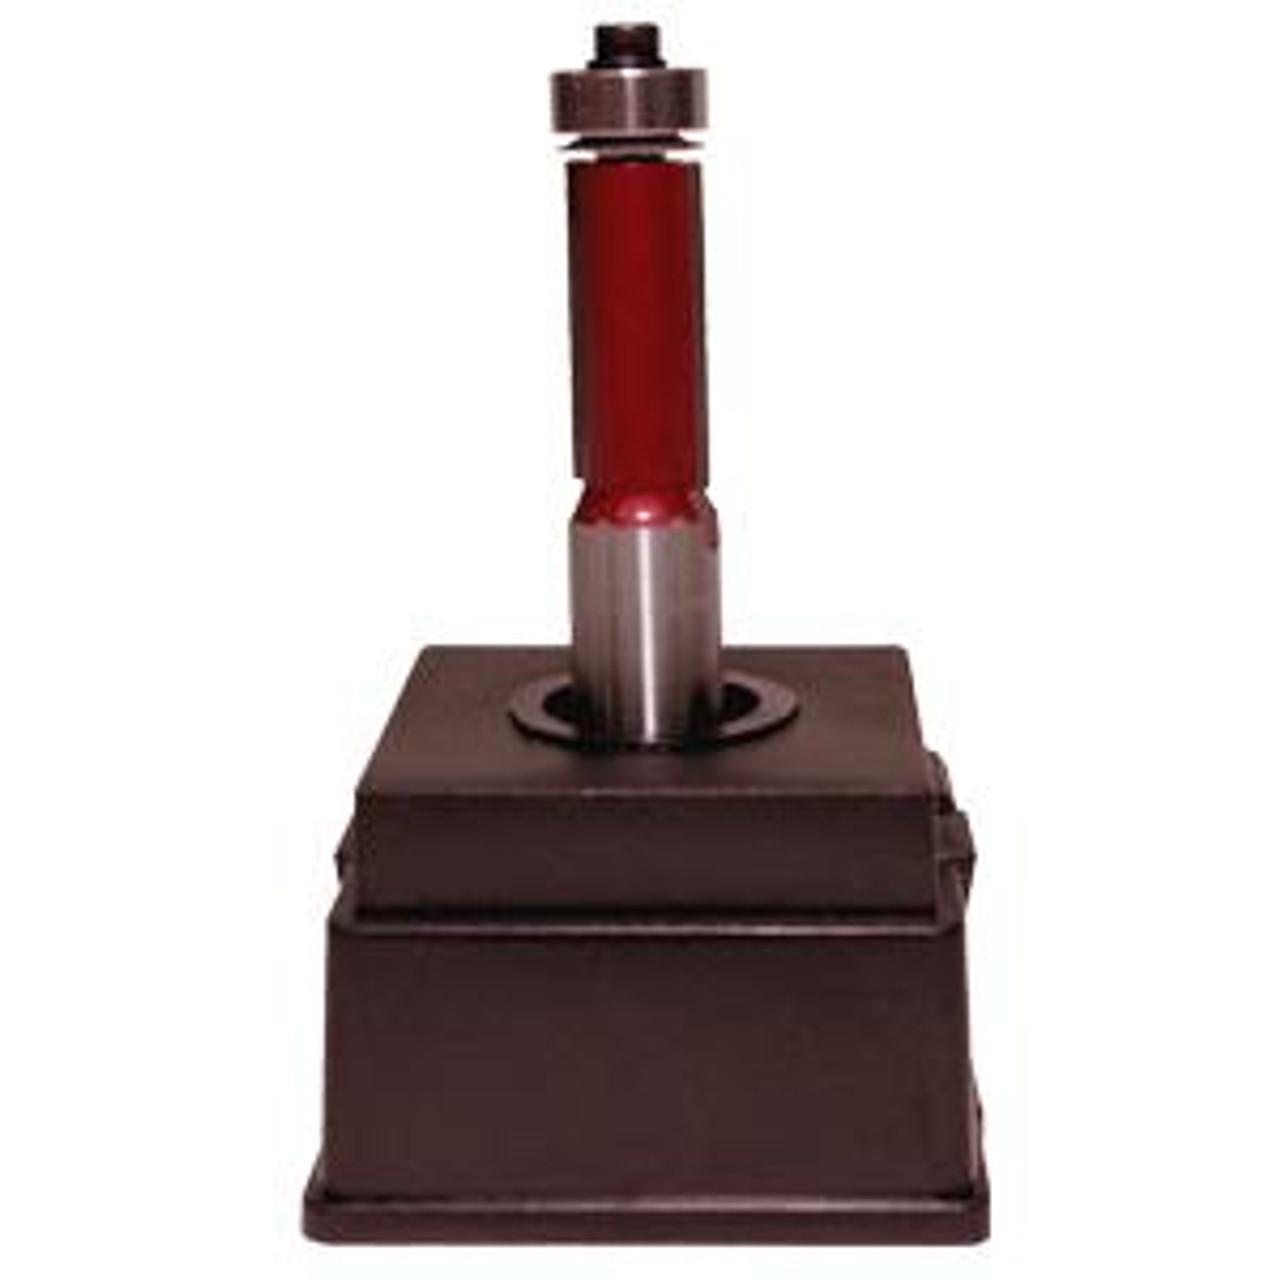 Cherry Tree Toys Flush Trim Router Bit 1/2 Dia x 1 length 1/2 Shank